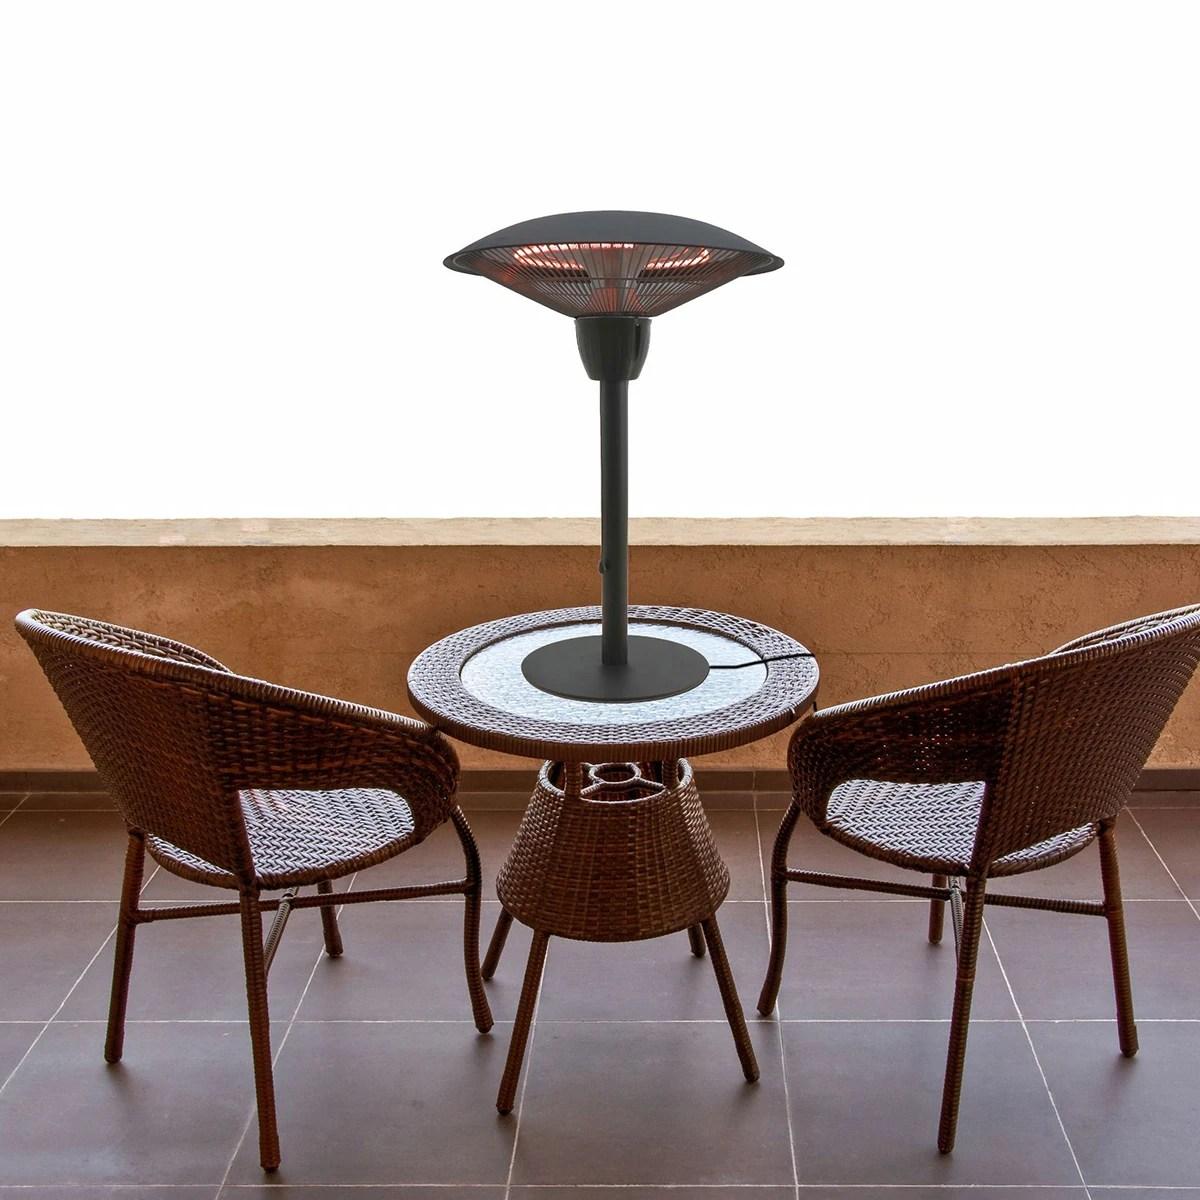 westinghouse 1500 watt electric tabletop patio heater